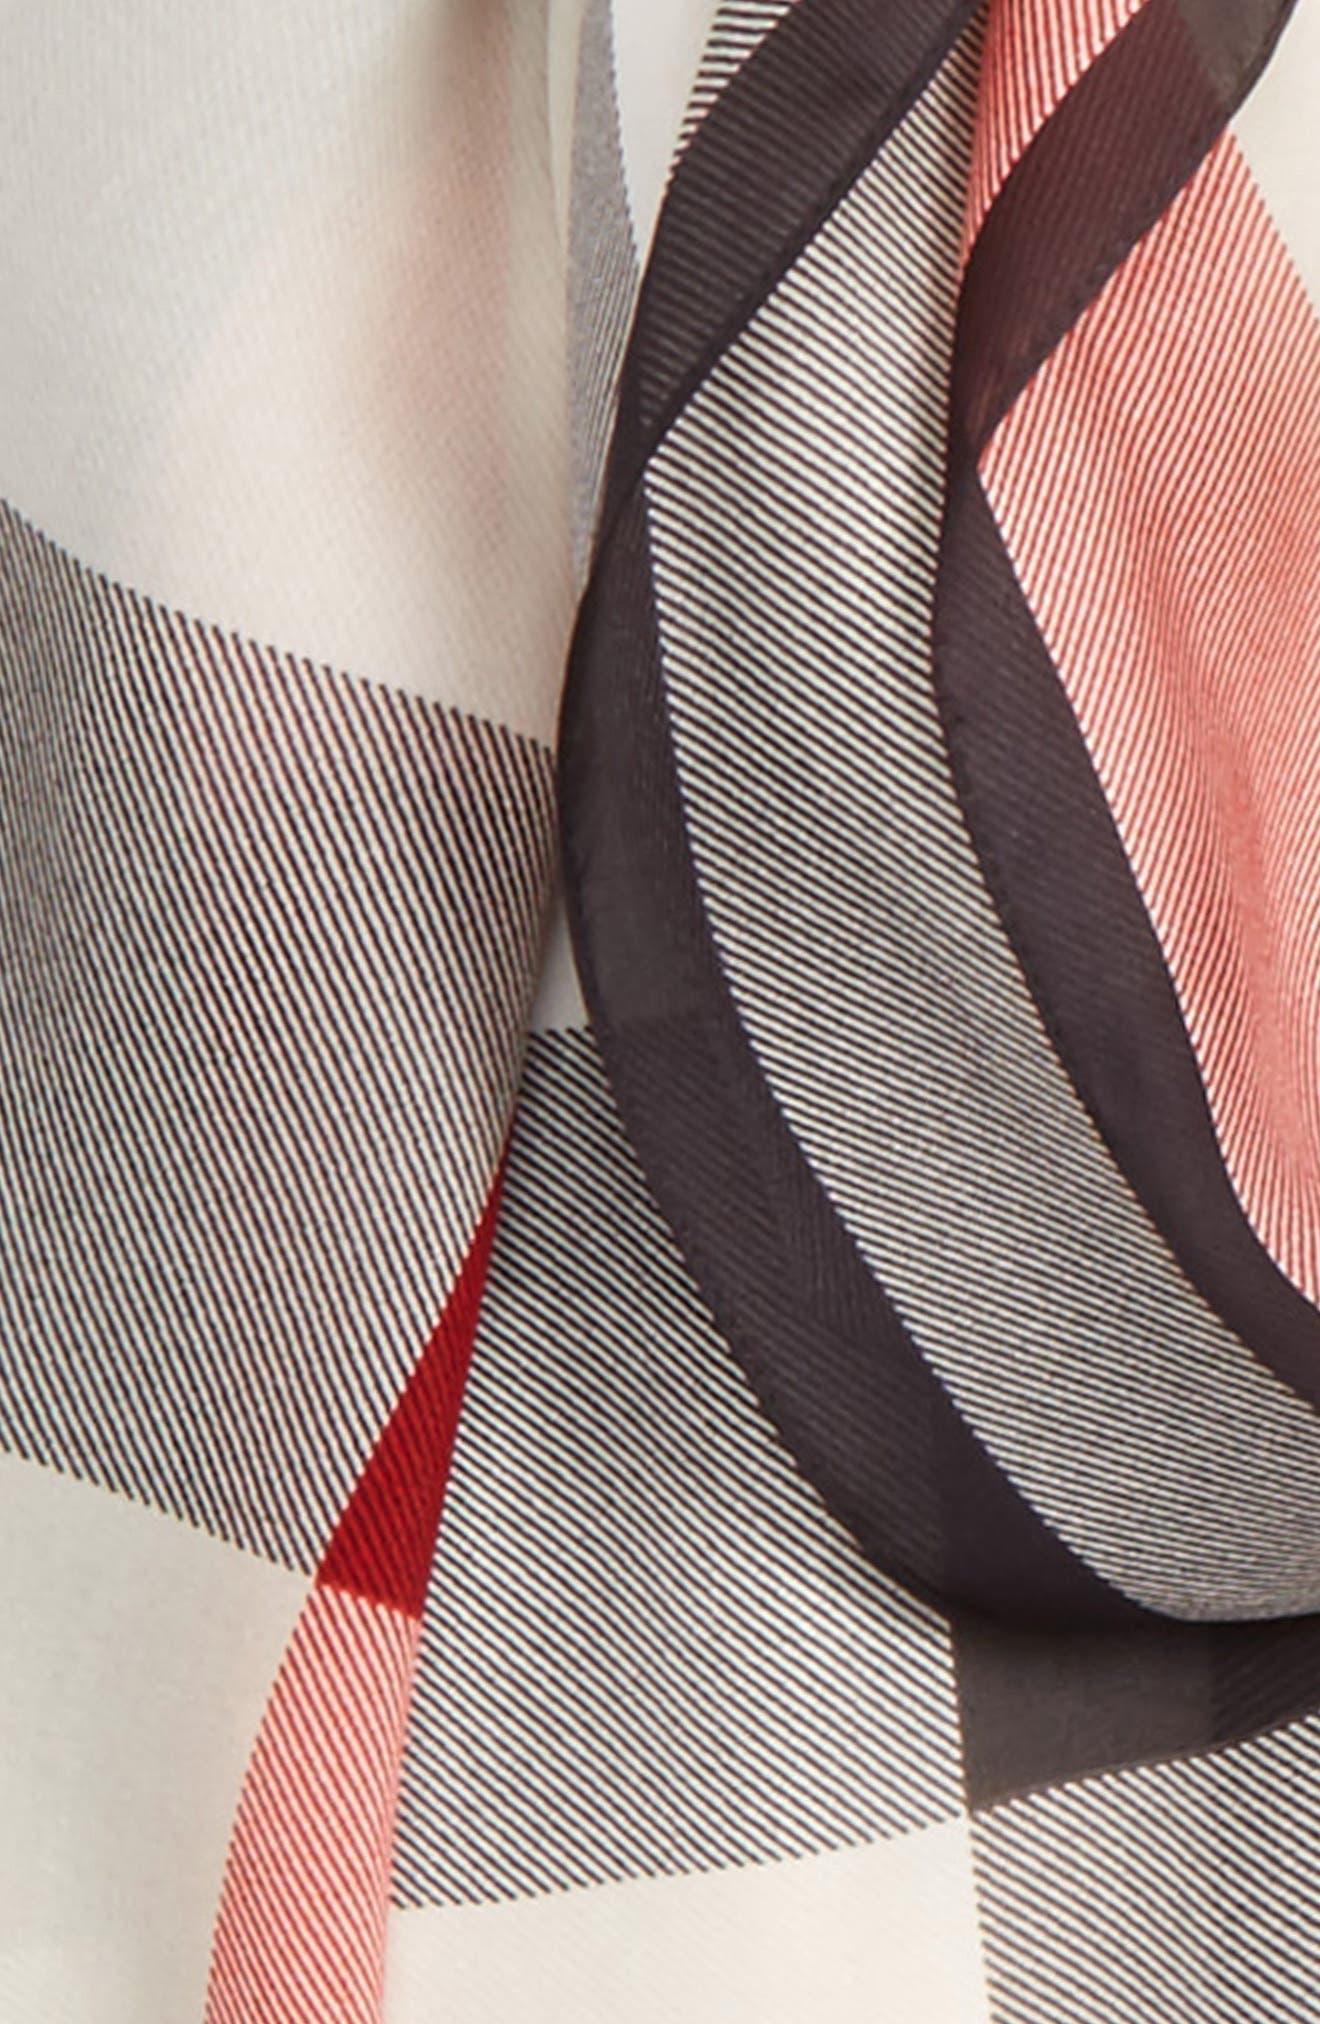 Alternate Image 3  - Burberry Mega Check Silk Scarf